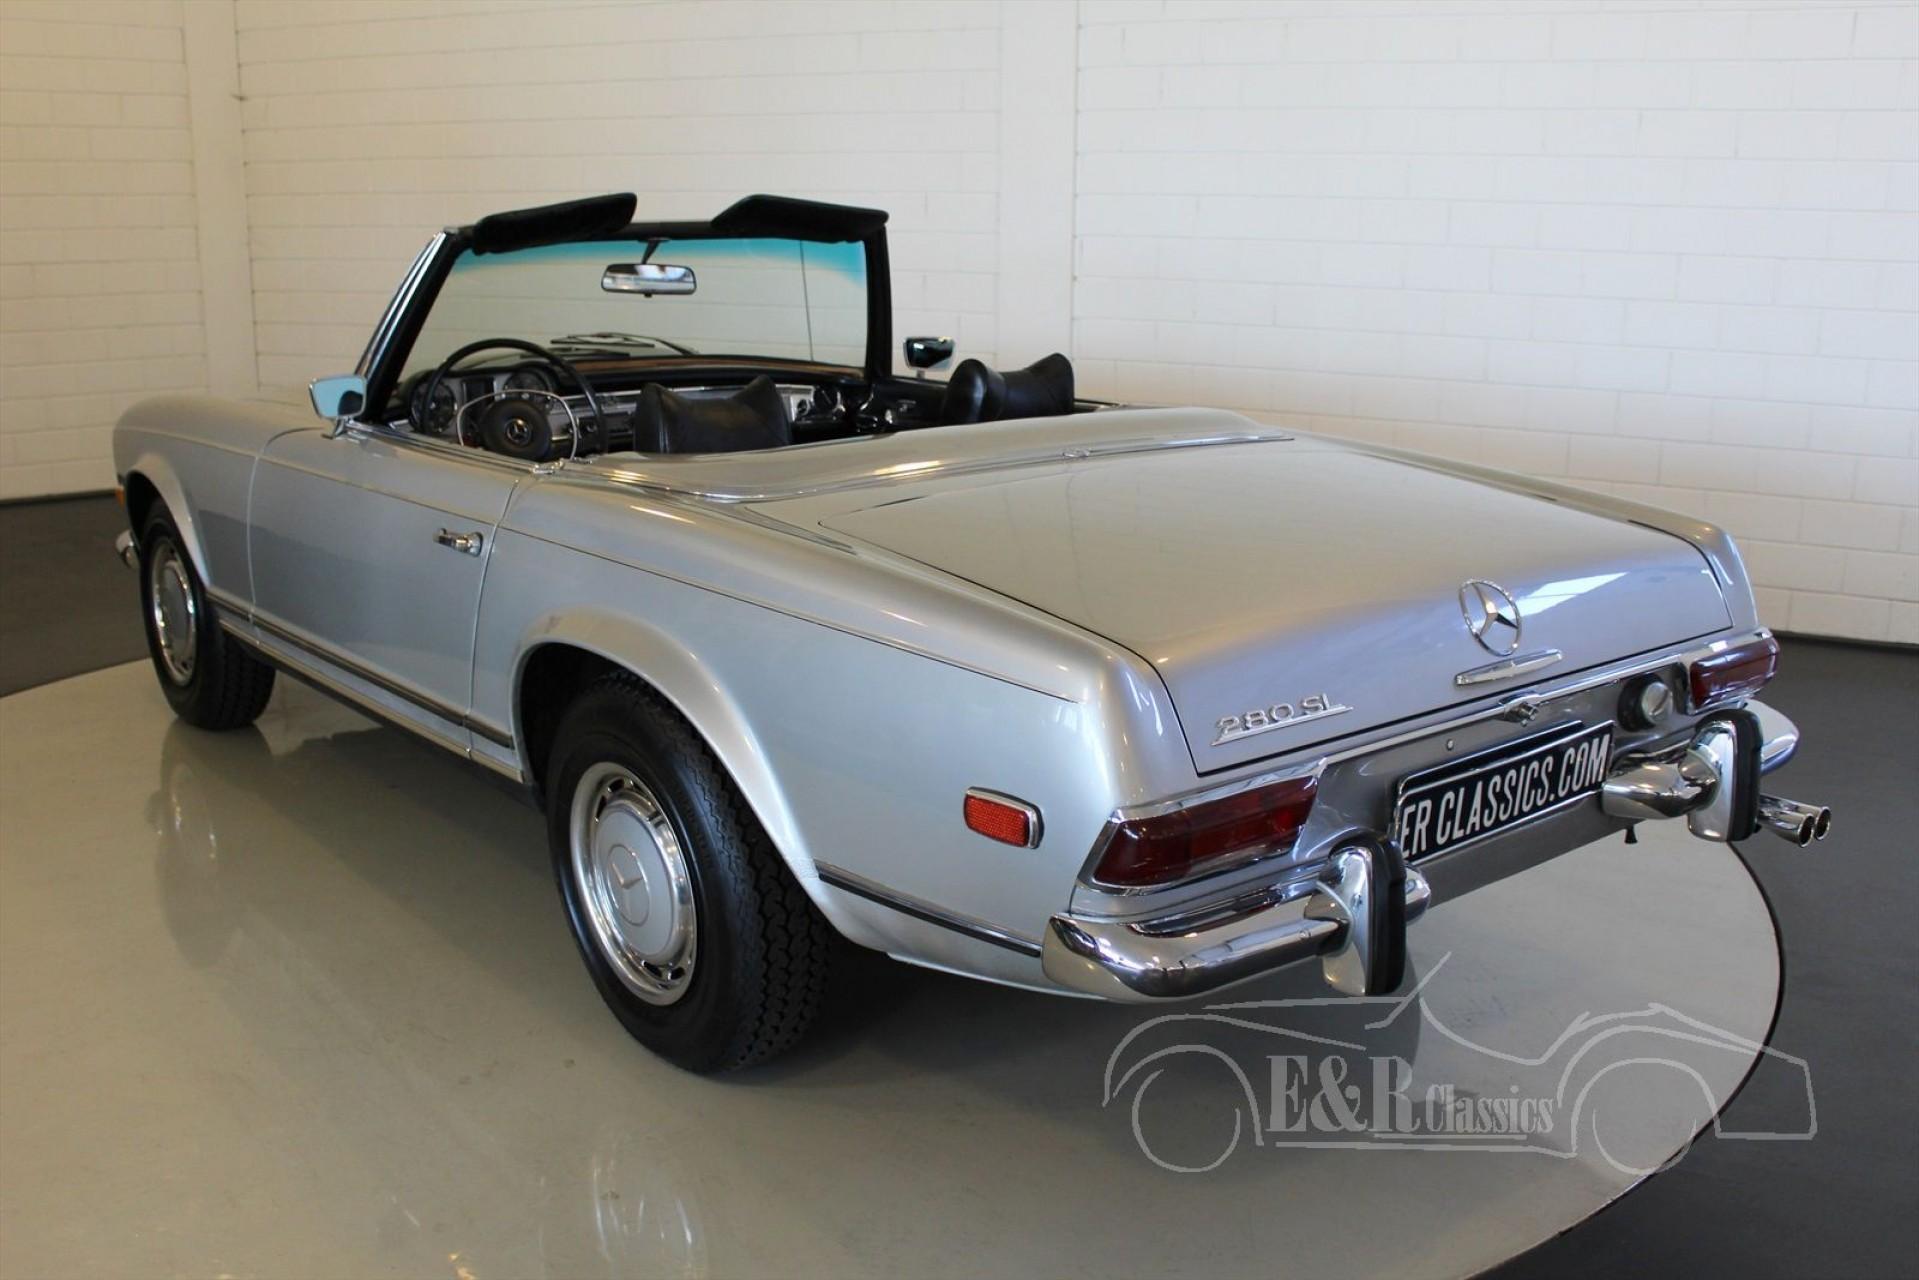 Mercedes benz 280sl 1969 for sale at erclassics for 1969 mercedes benz